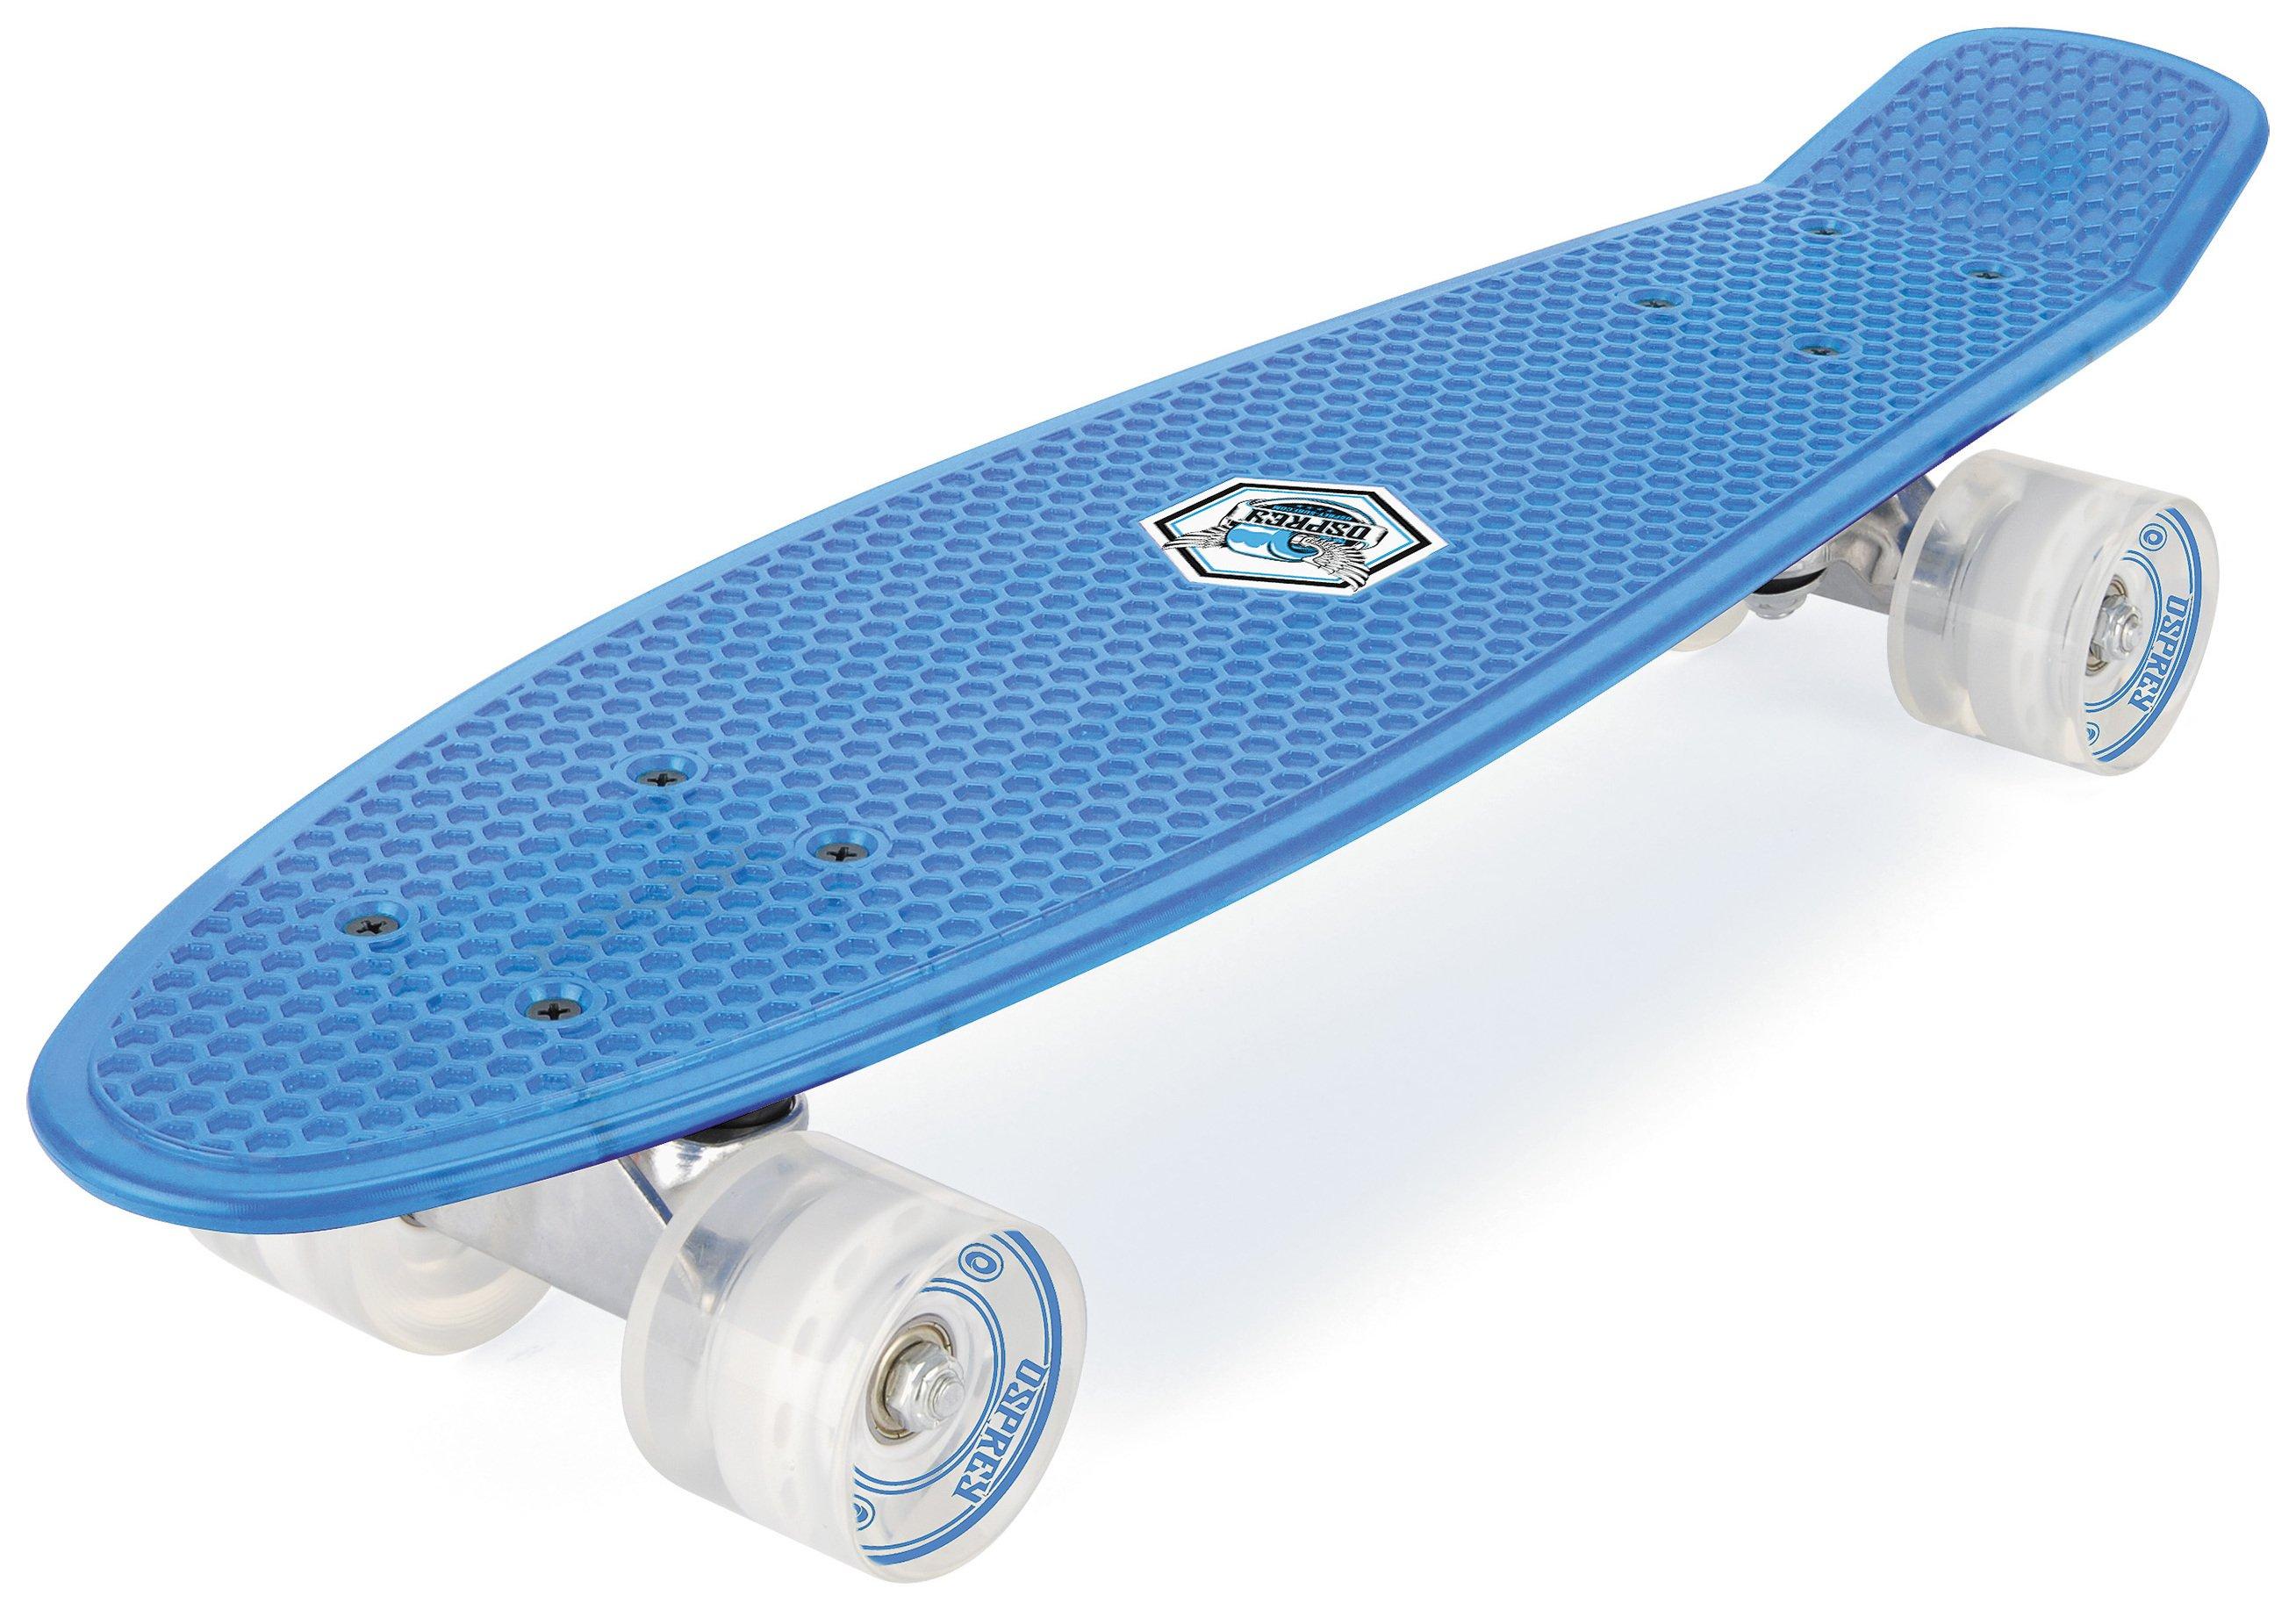 Osprey Retro PC Skateboard - Blue.